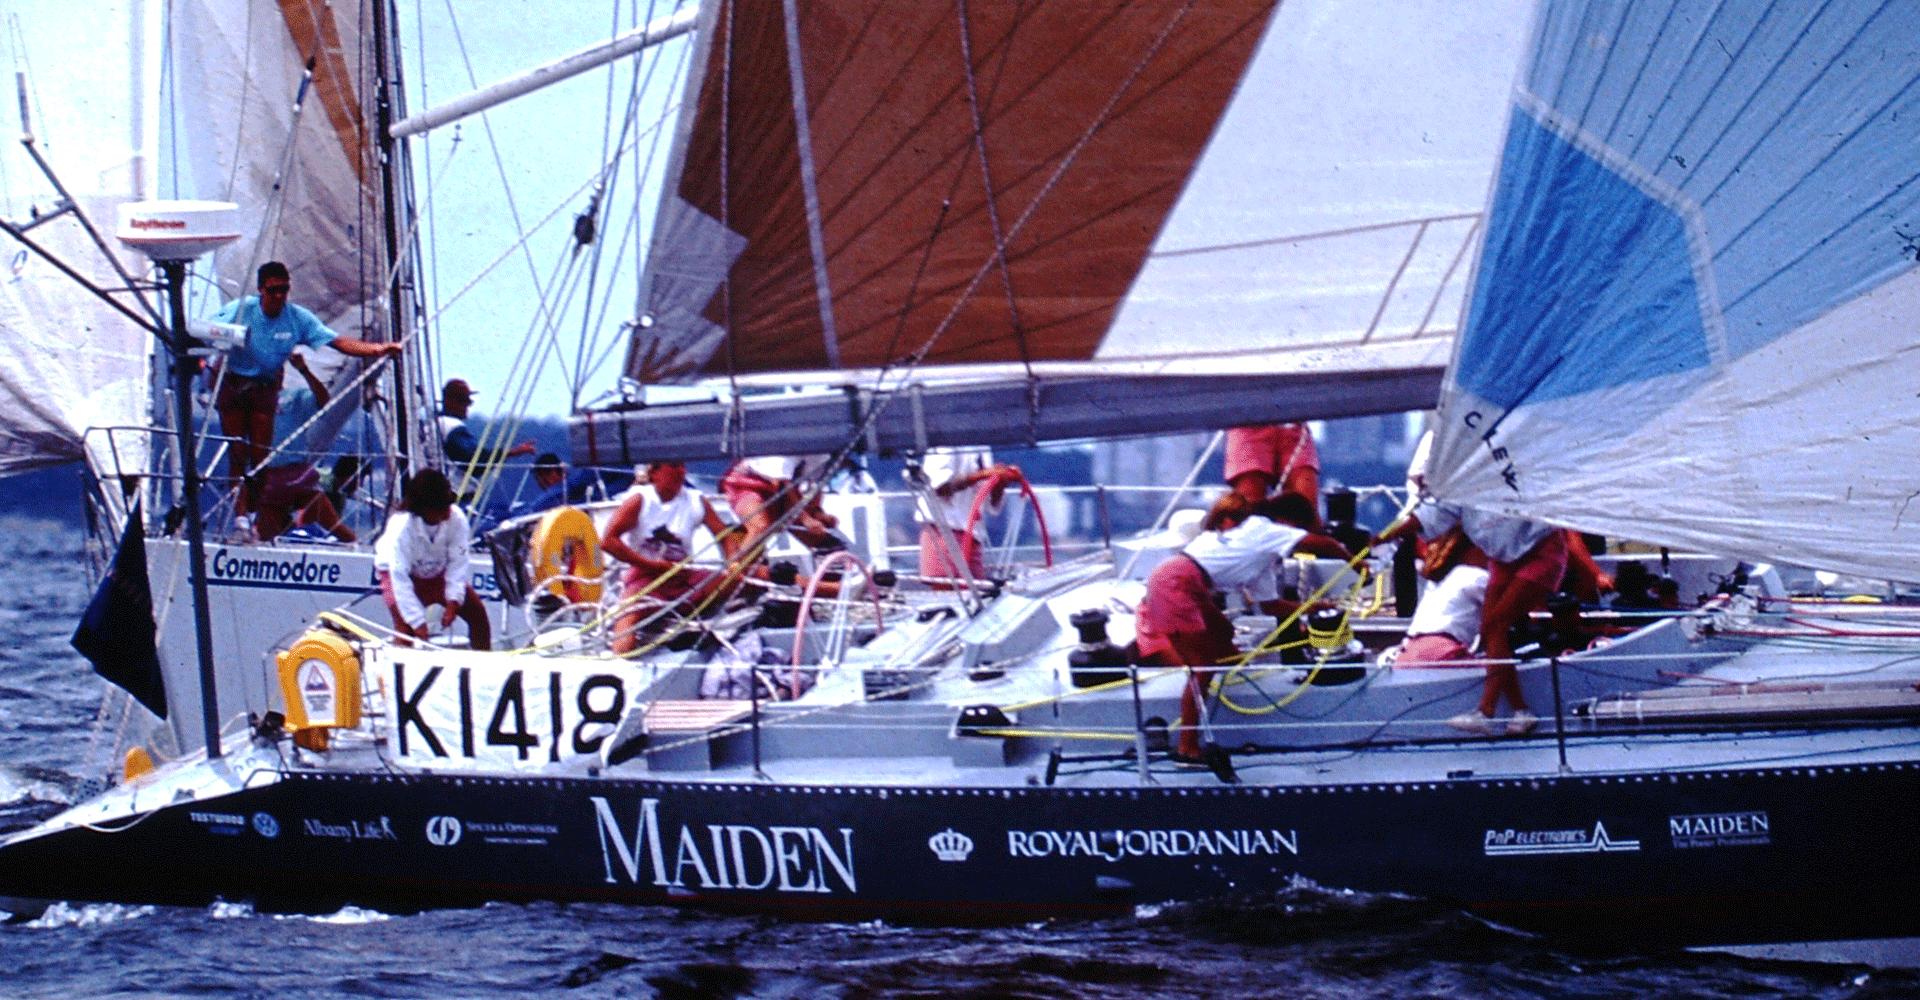 Maiden Sailing